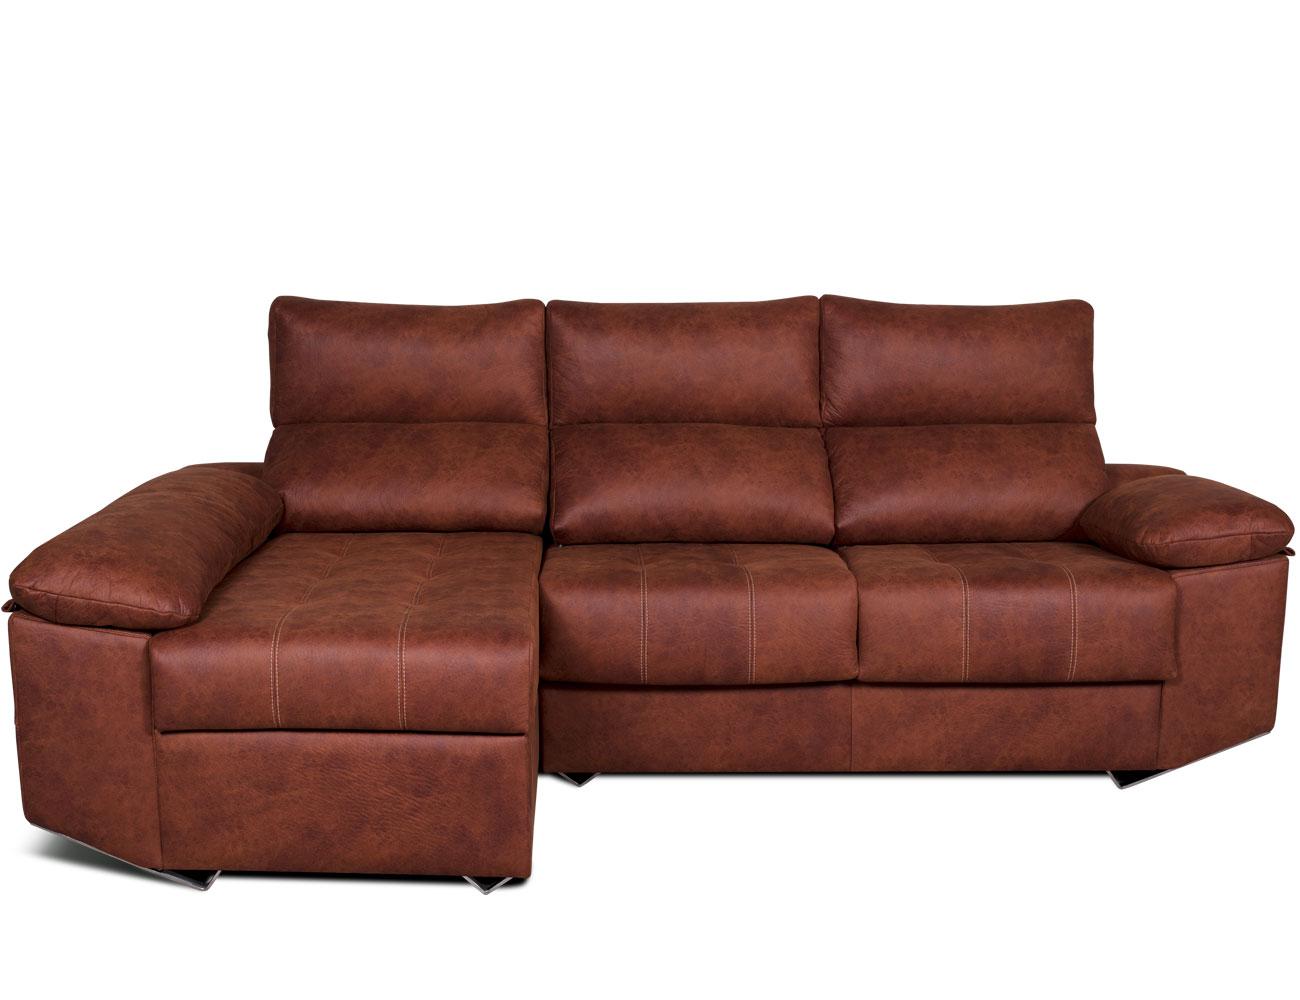 Sofa chaiselongue moderno patas forma tejido anti manchas 27